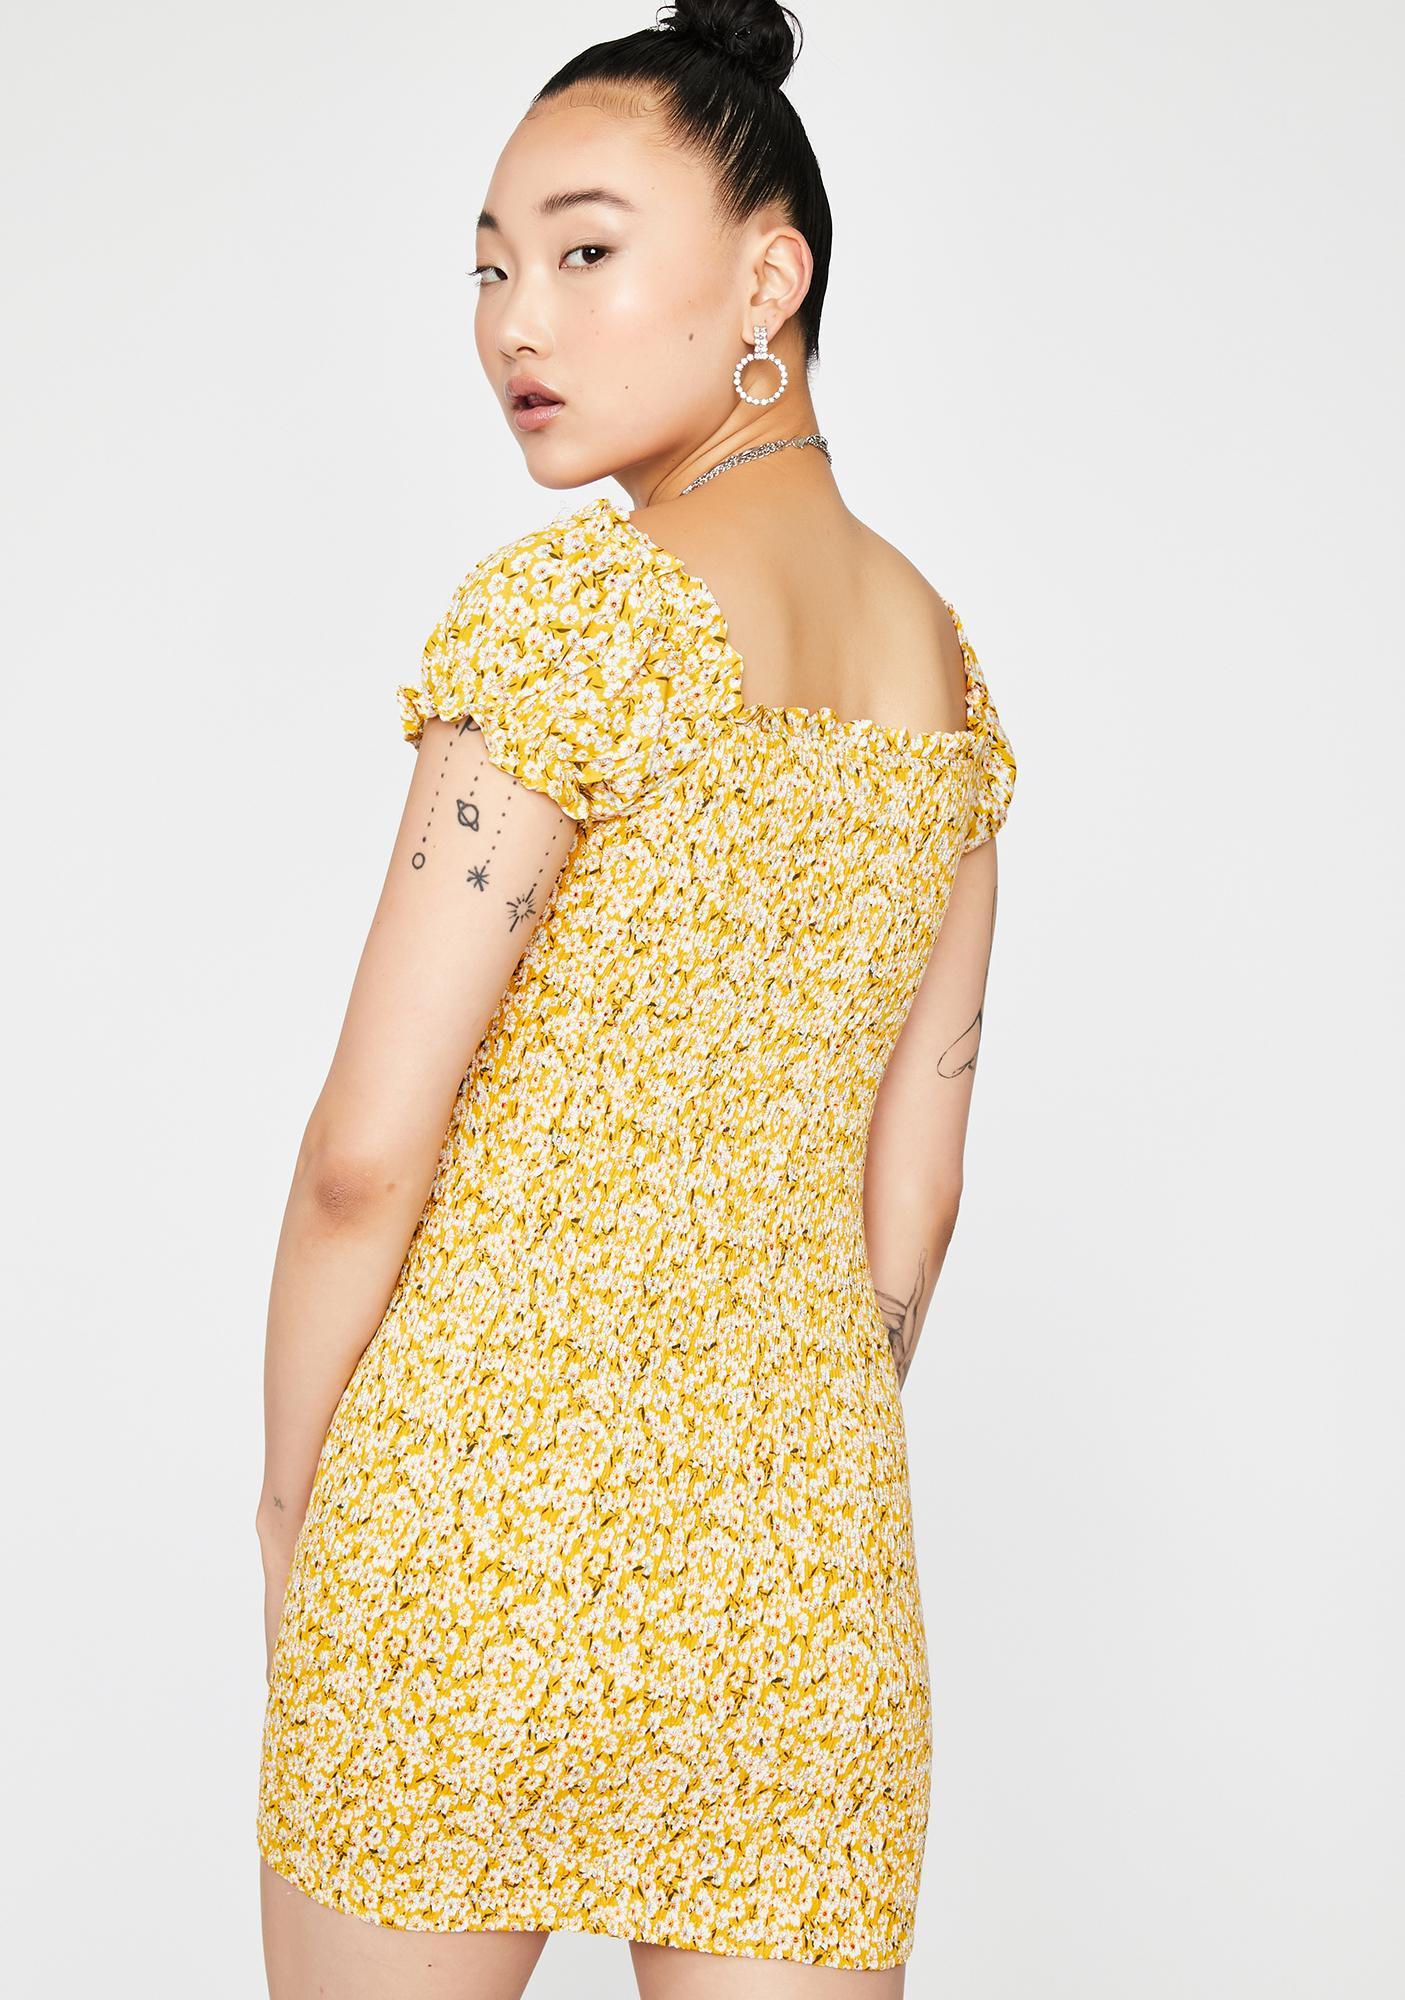 Sassy Sunbeam Floral Dress